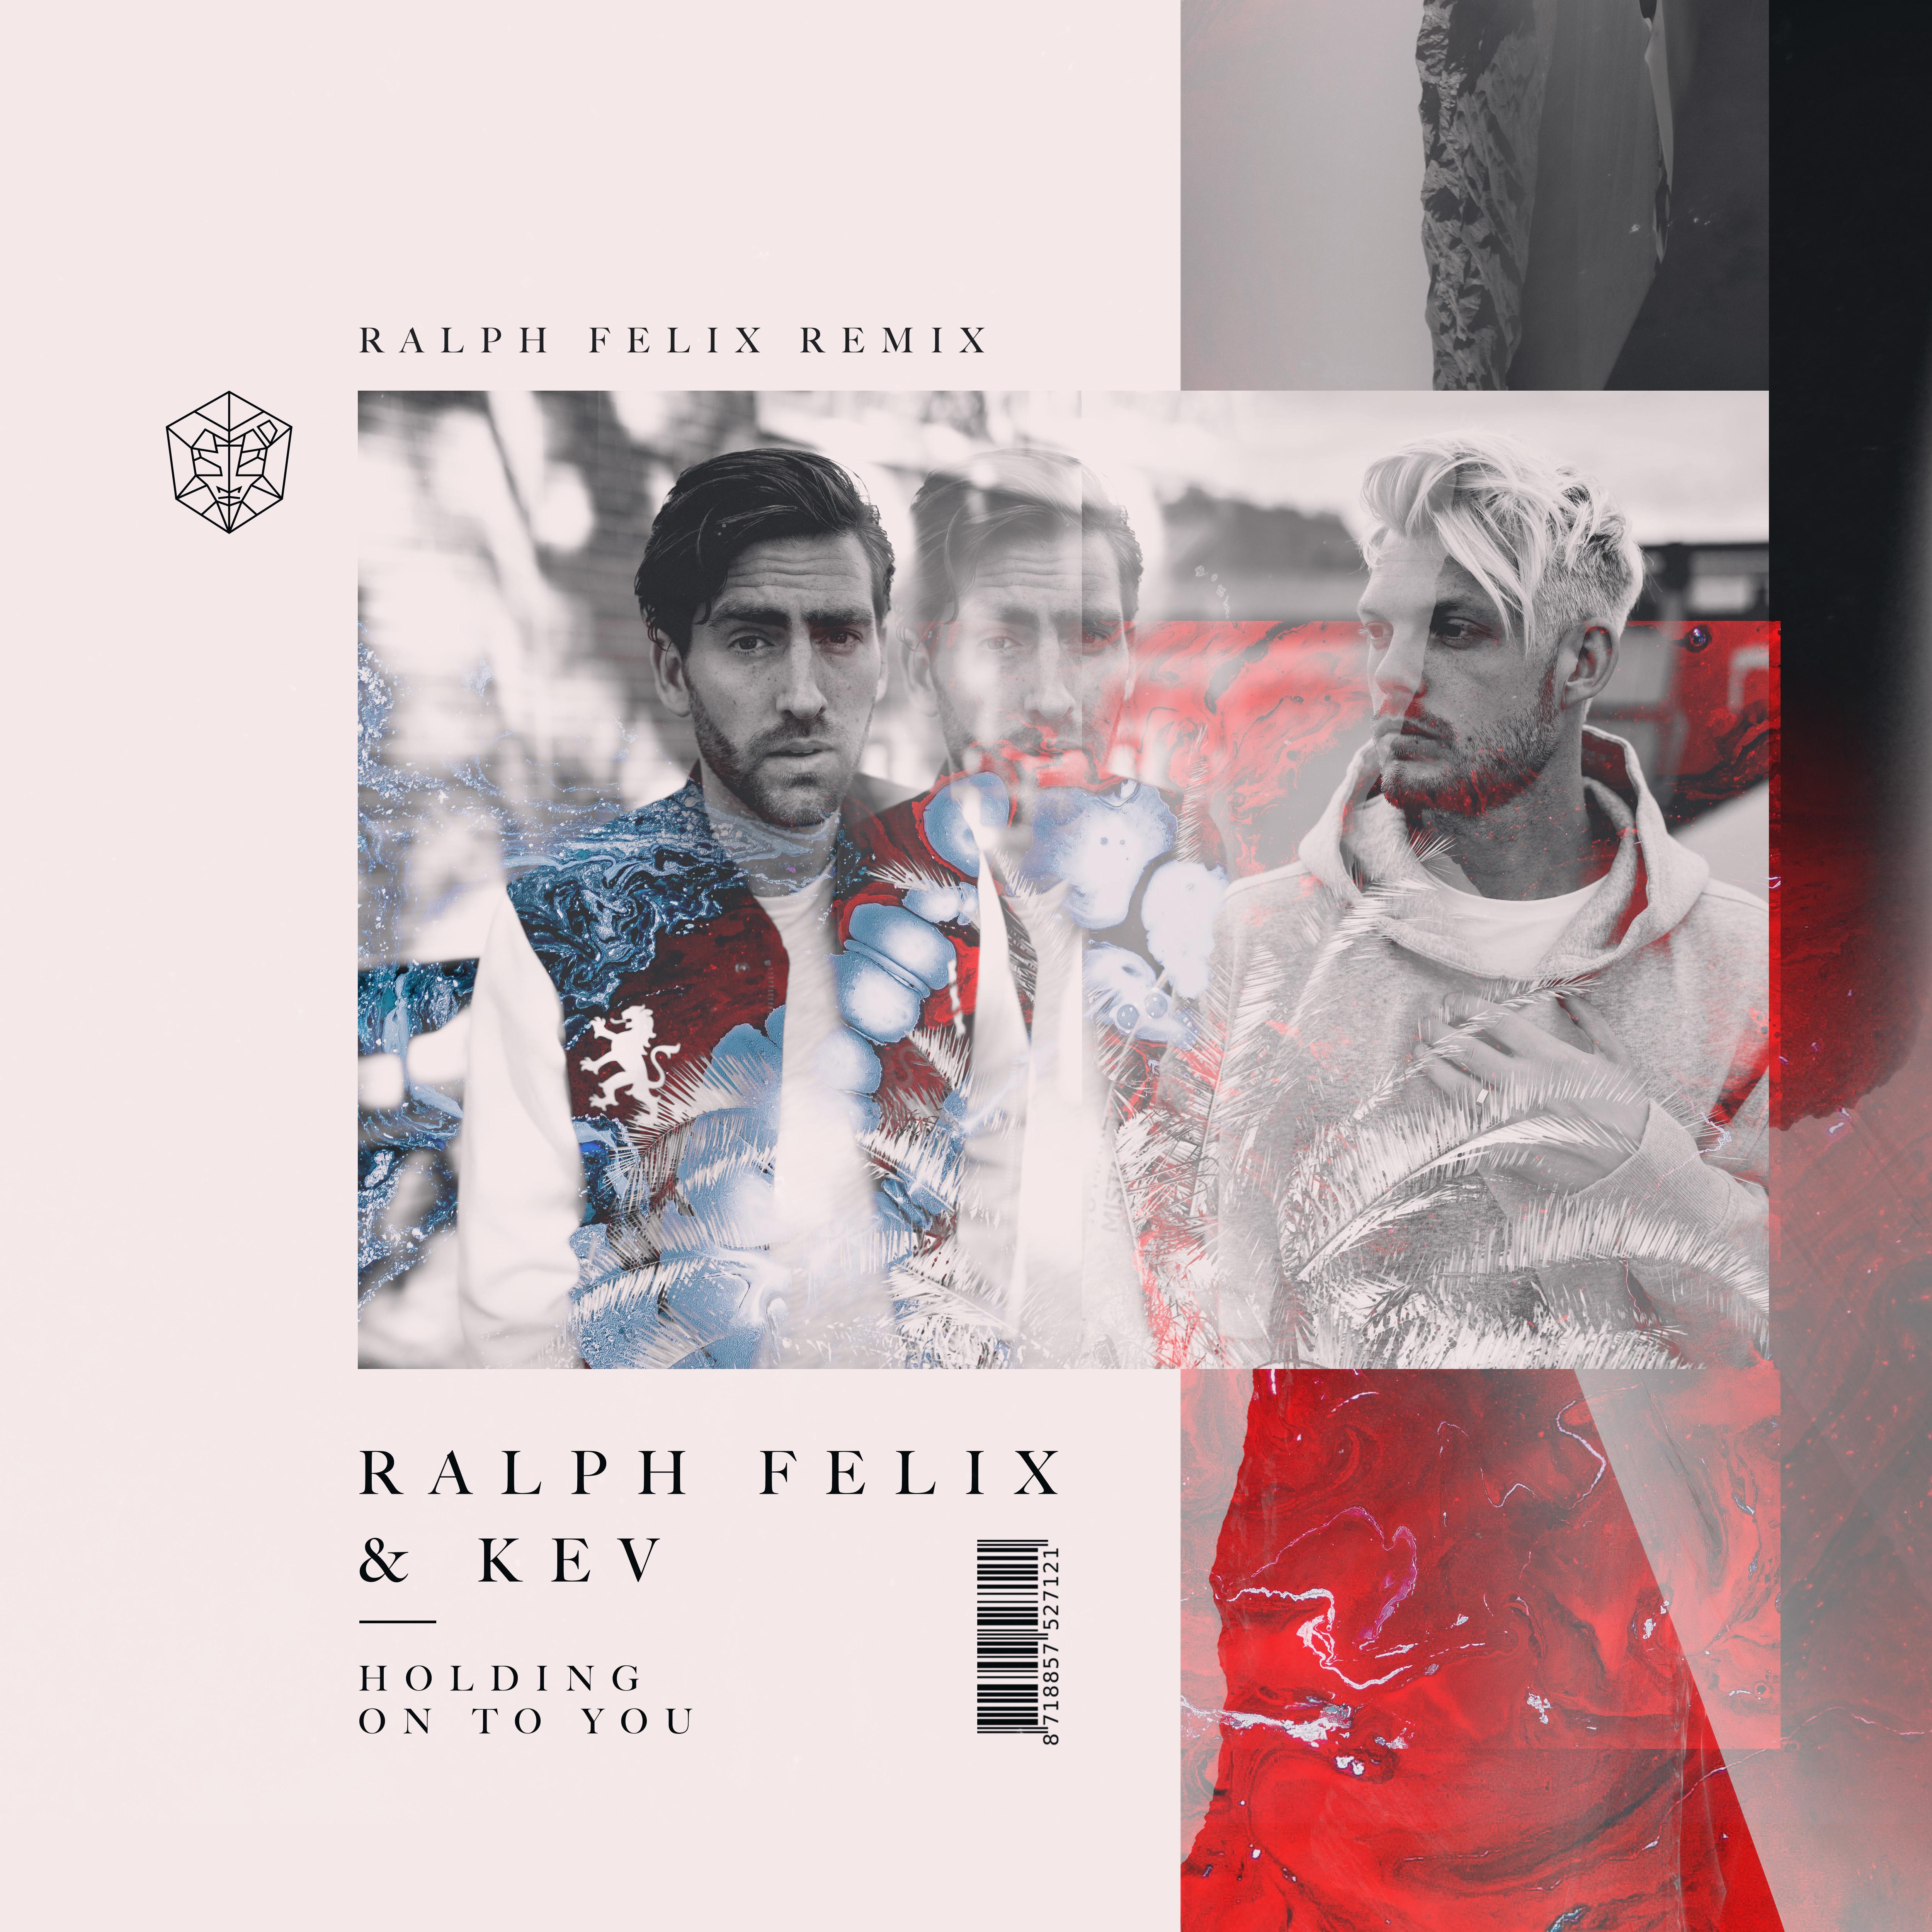 ralph_felix_festival_remix.jpg